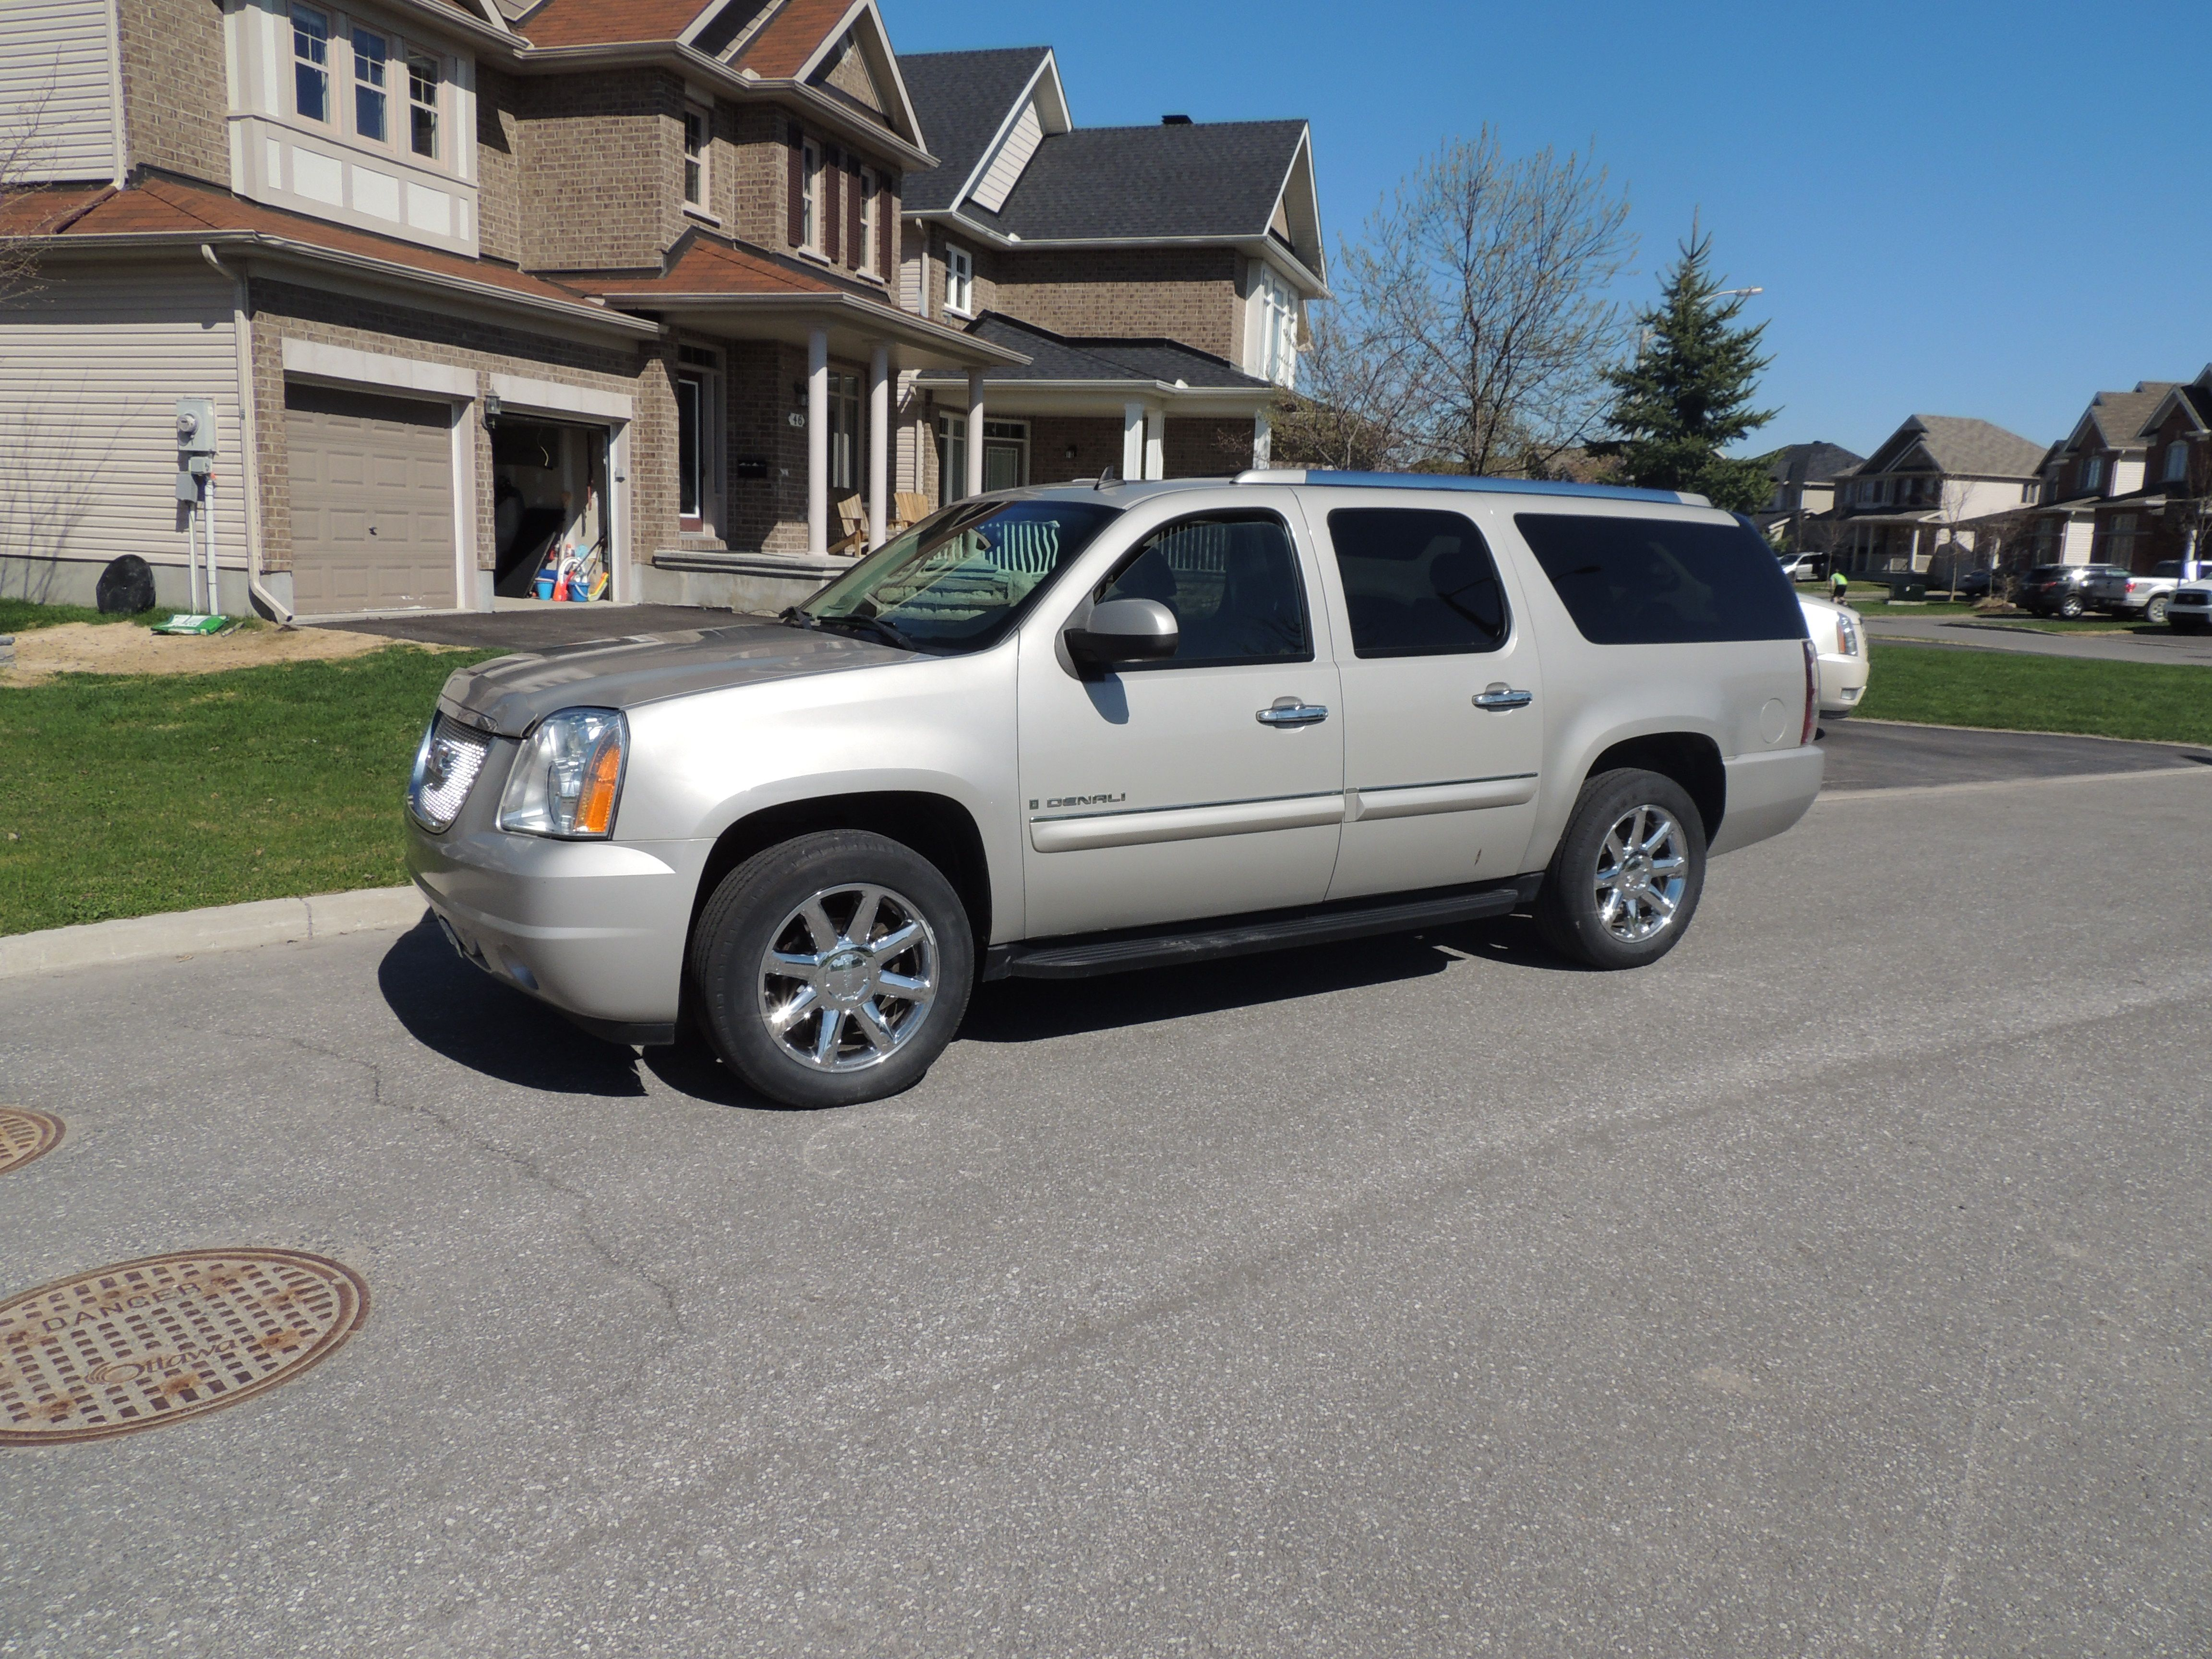 2007 Gmc Yukon Denali Xl Yukon Denali Vehicles Cars